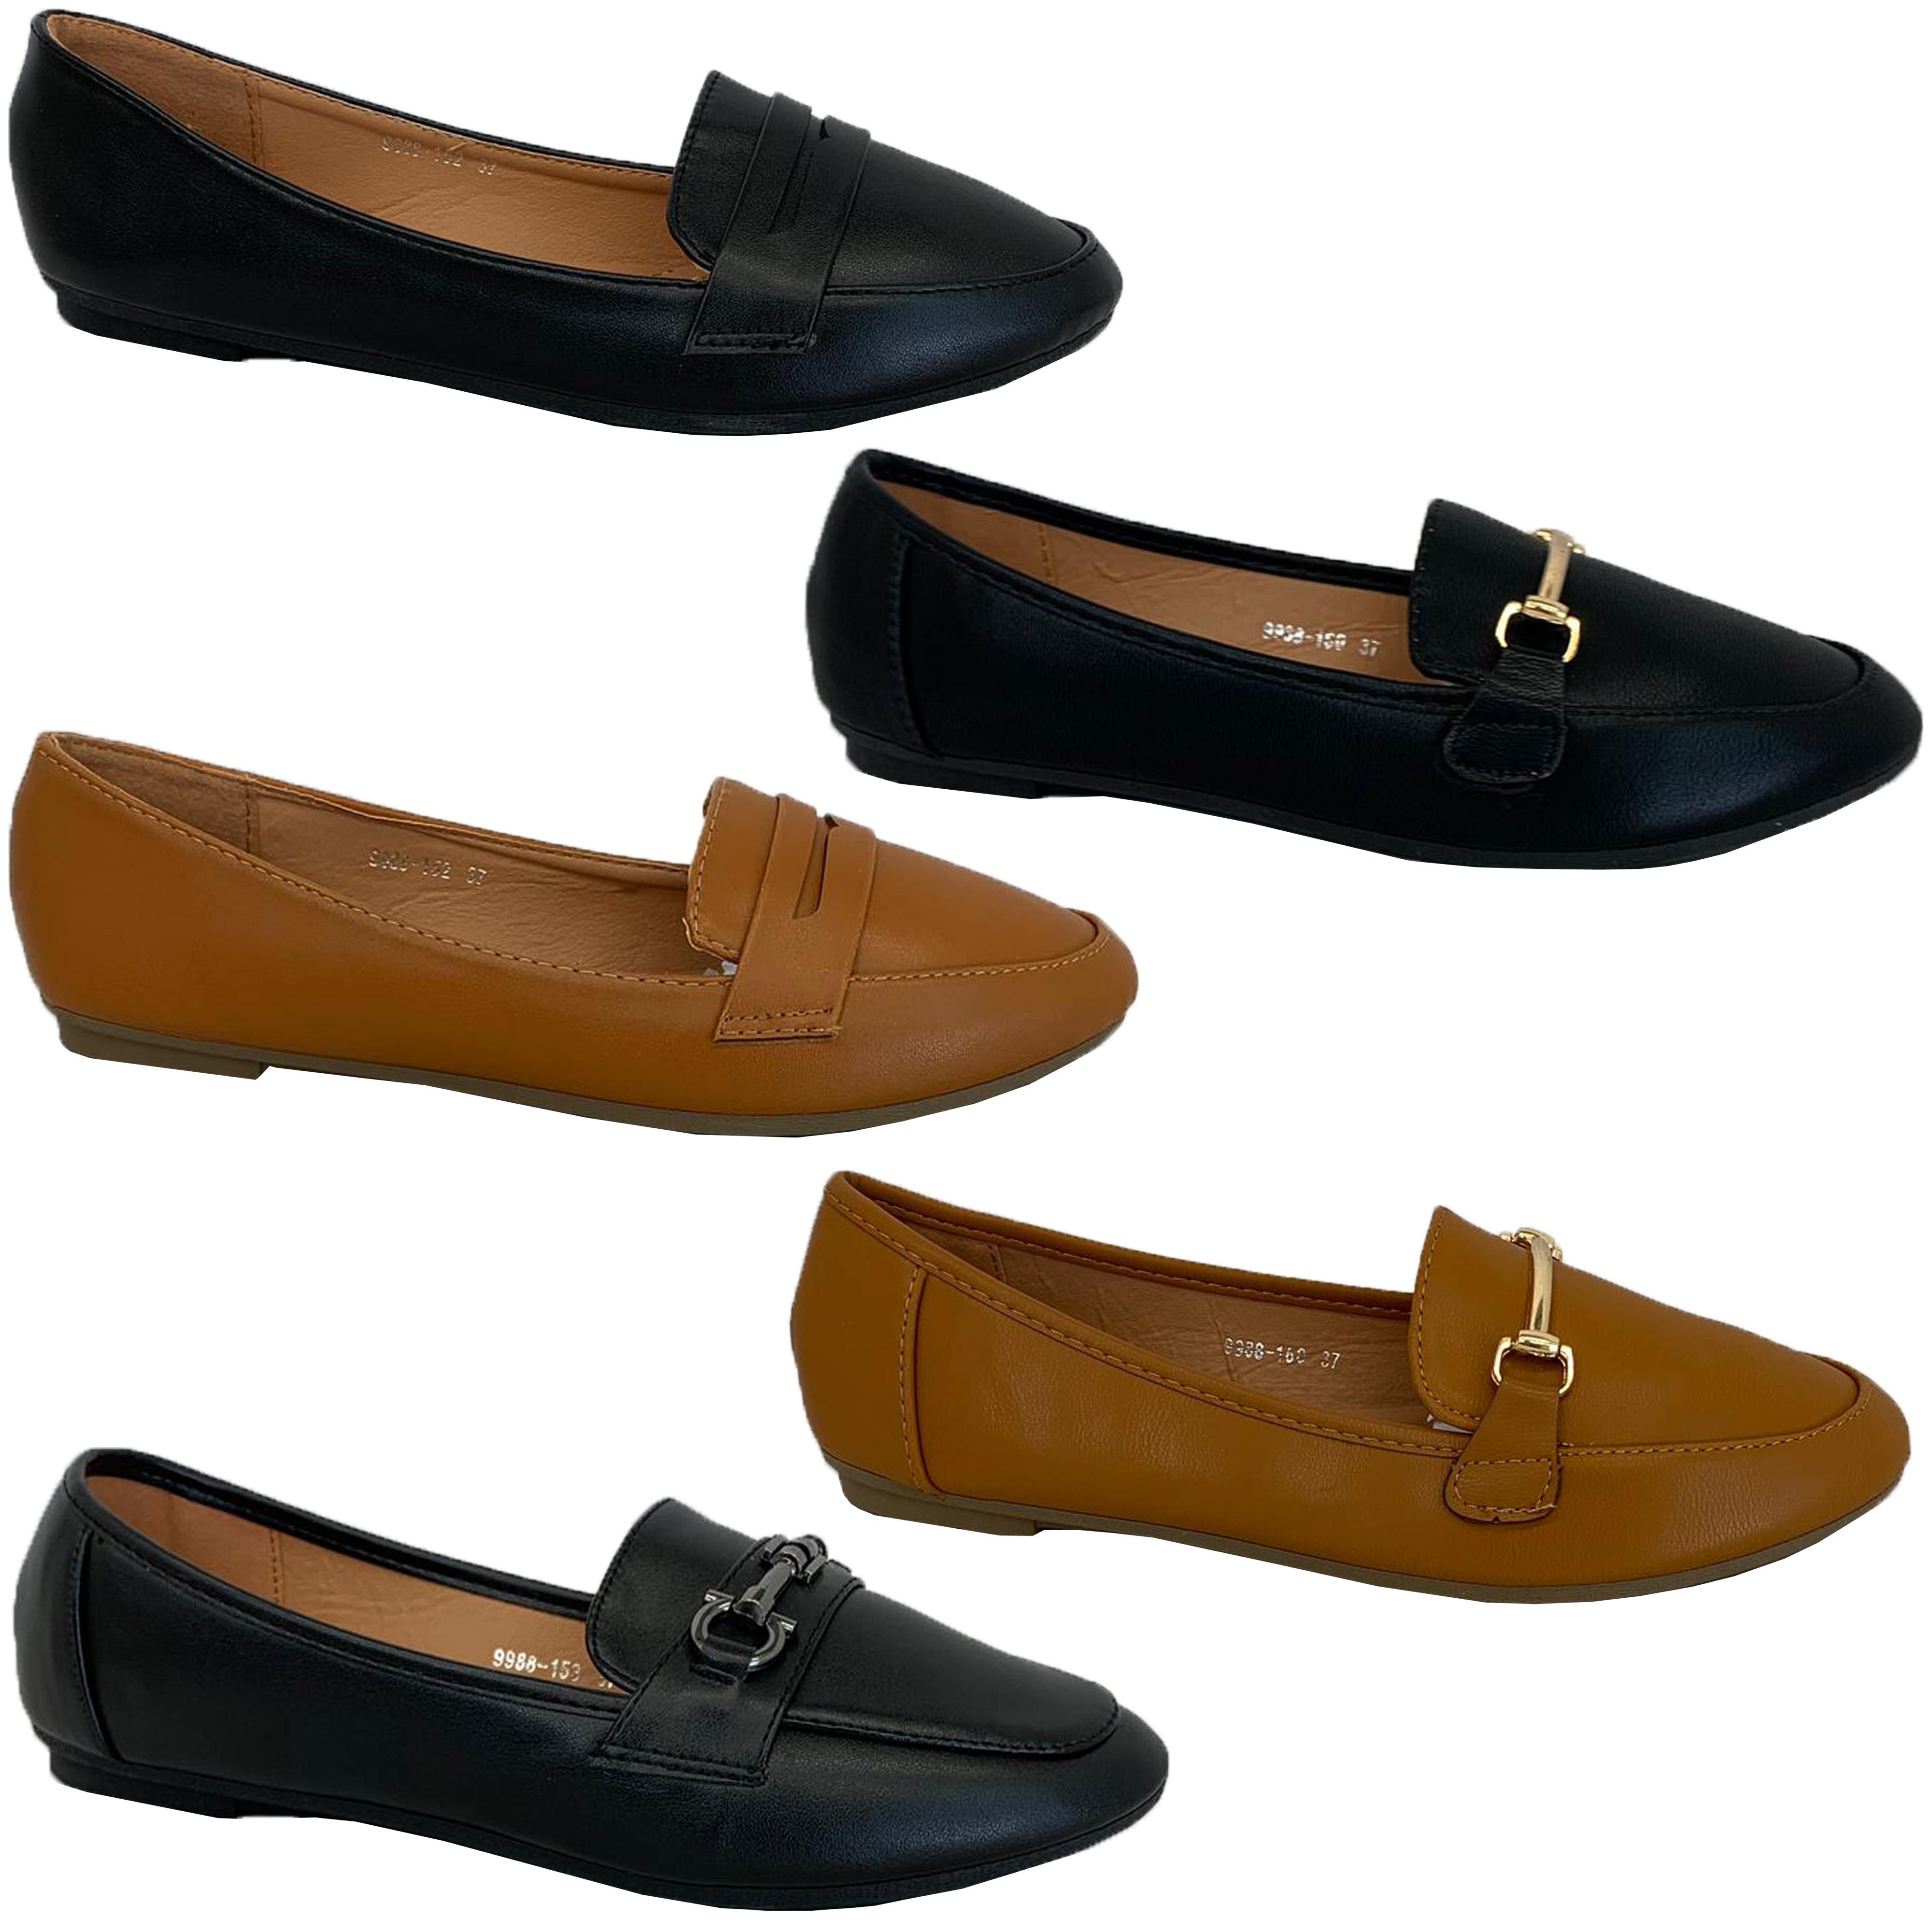 Homme design italien en cuir look strass à enfiler chaussures crème neuf